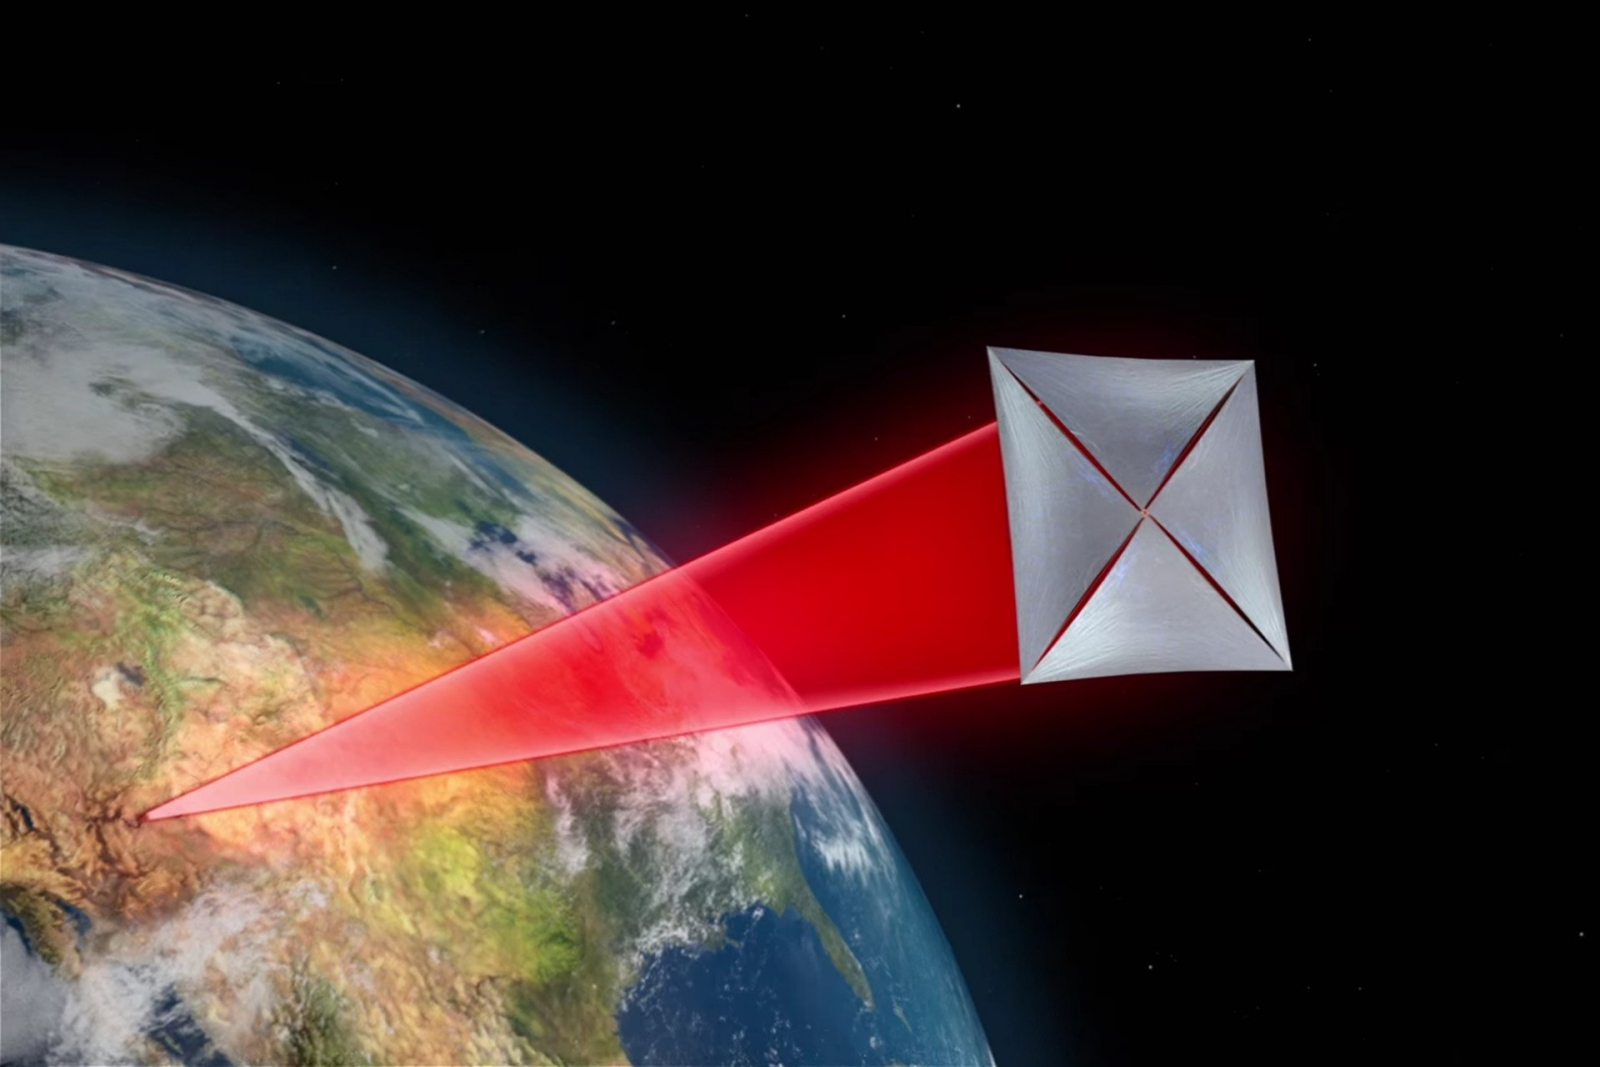 Breakthrough Starshot Initiative sending nano-starship